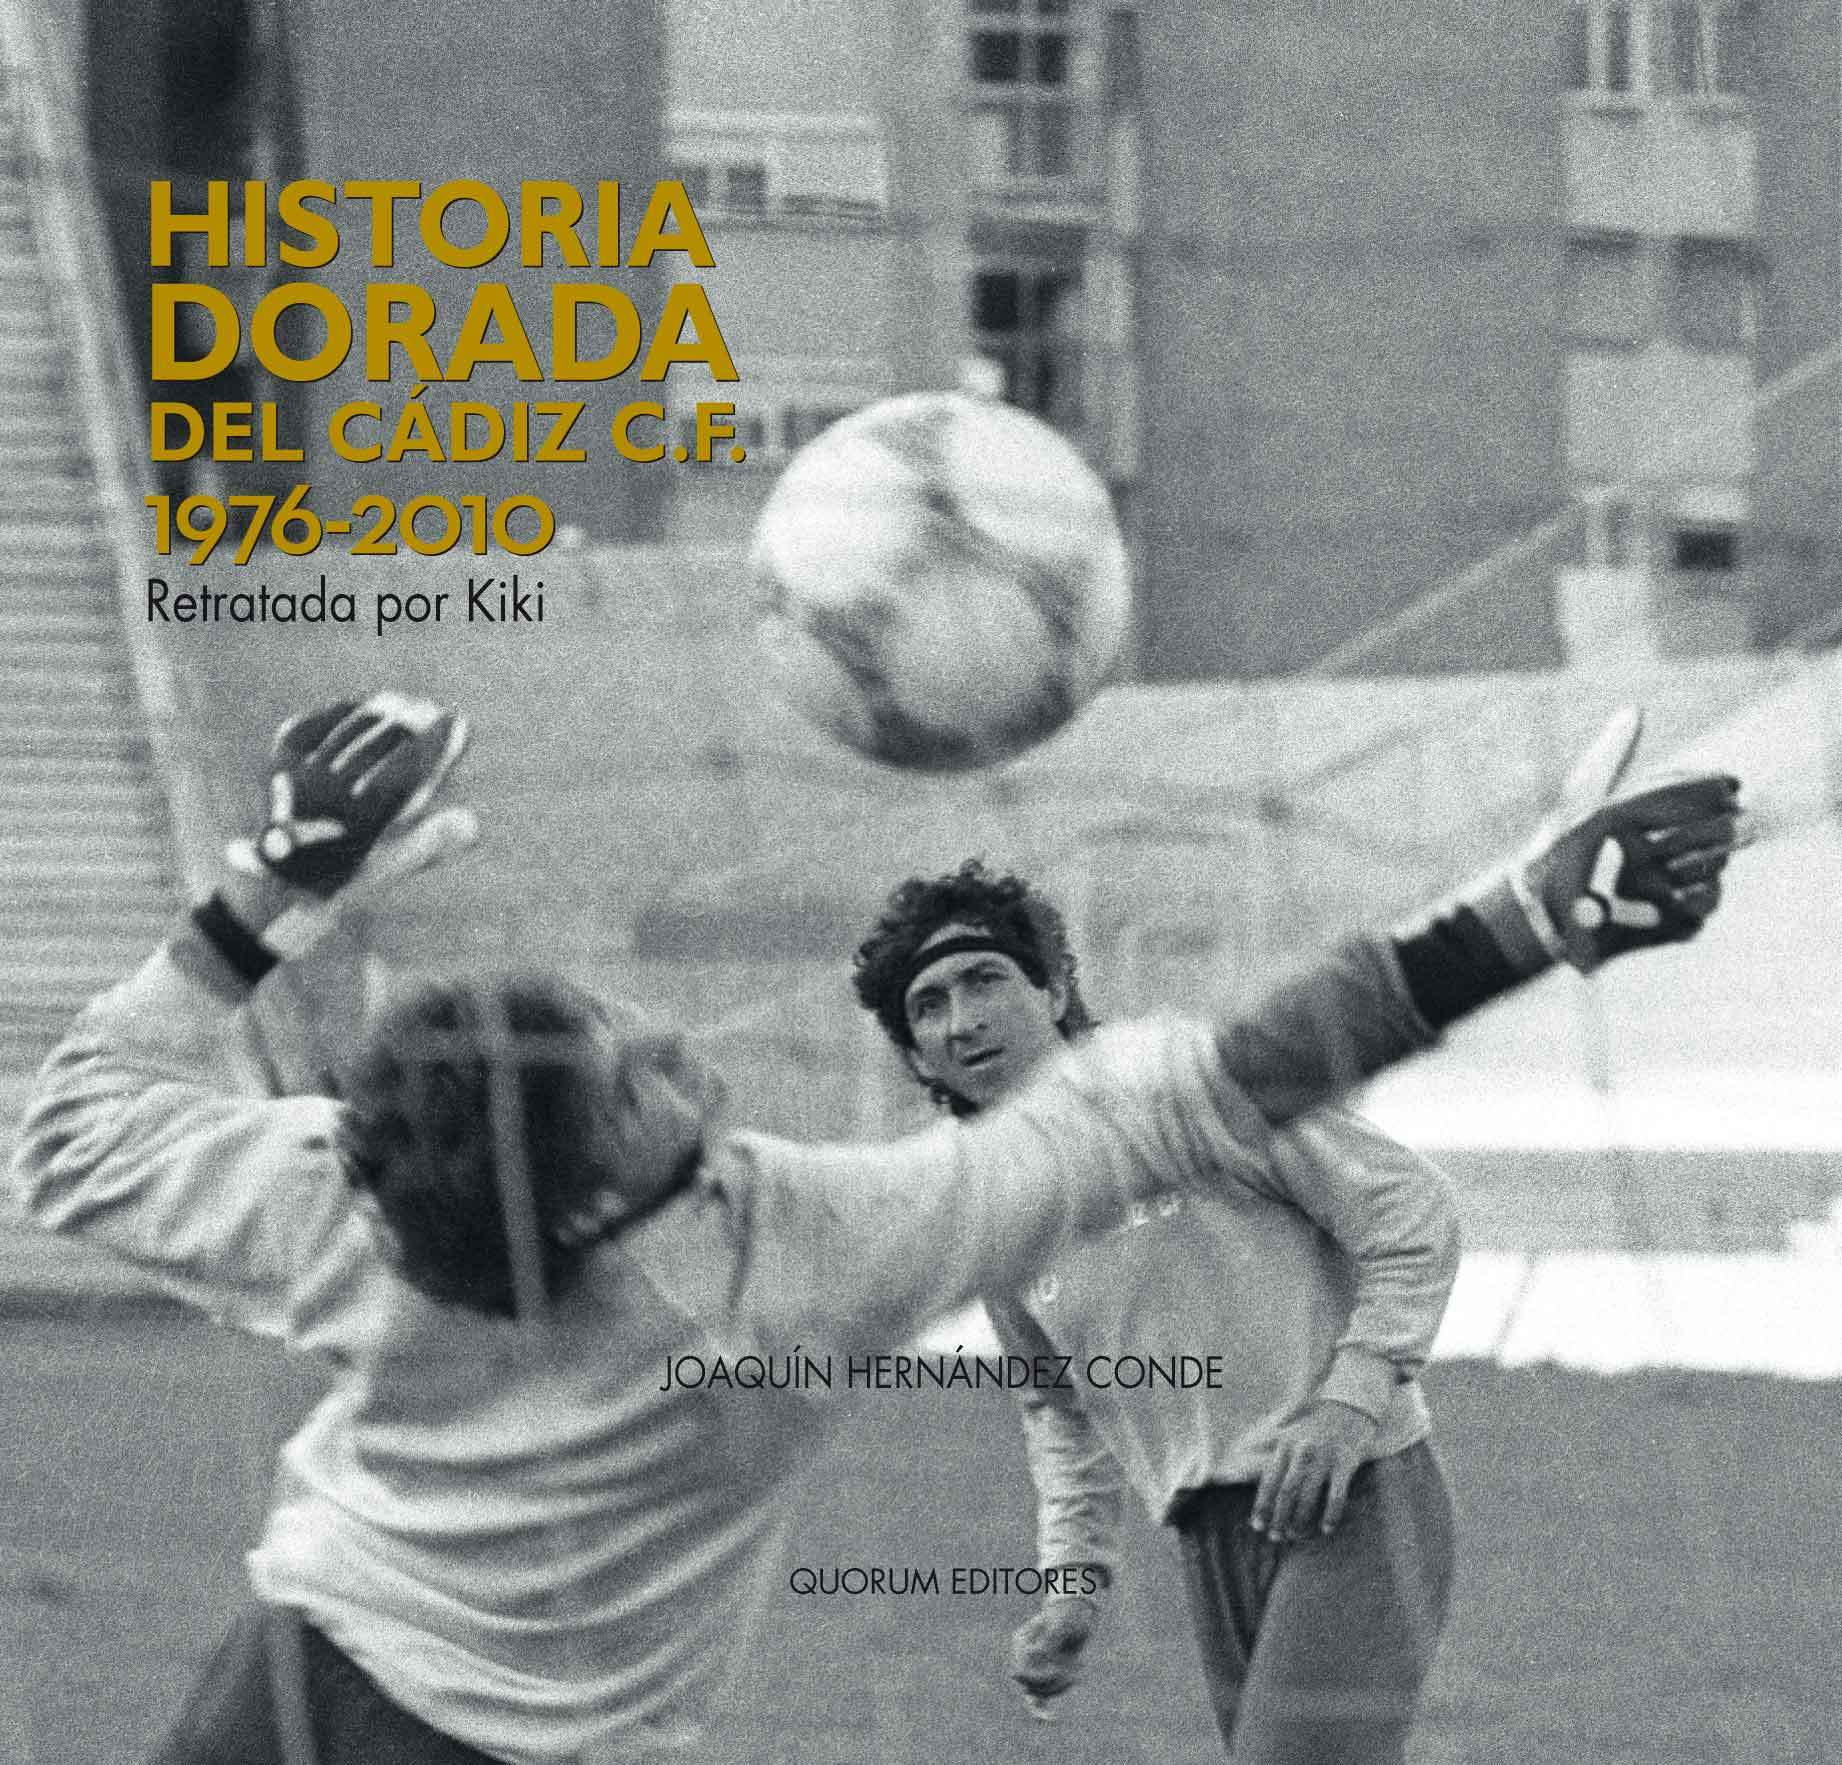 HISTORIA DORADA DEL CÁDIZ C.F. 1976-2010